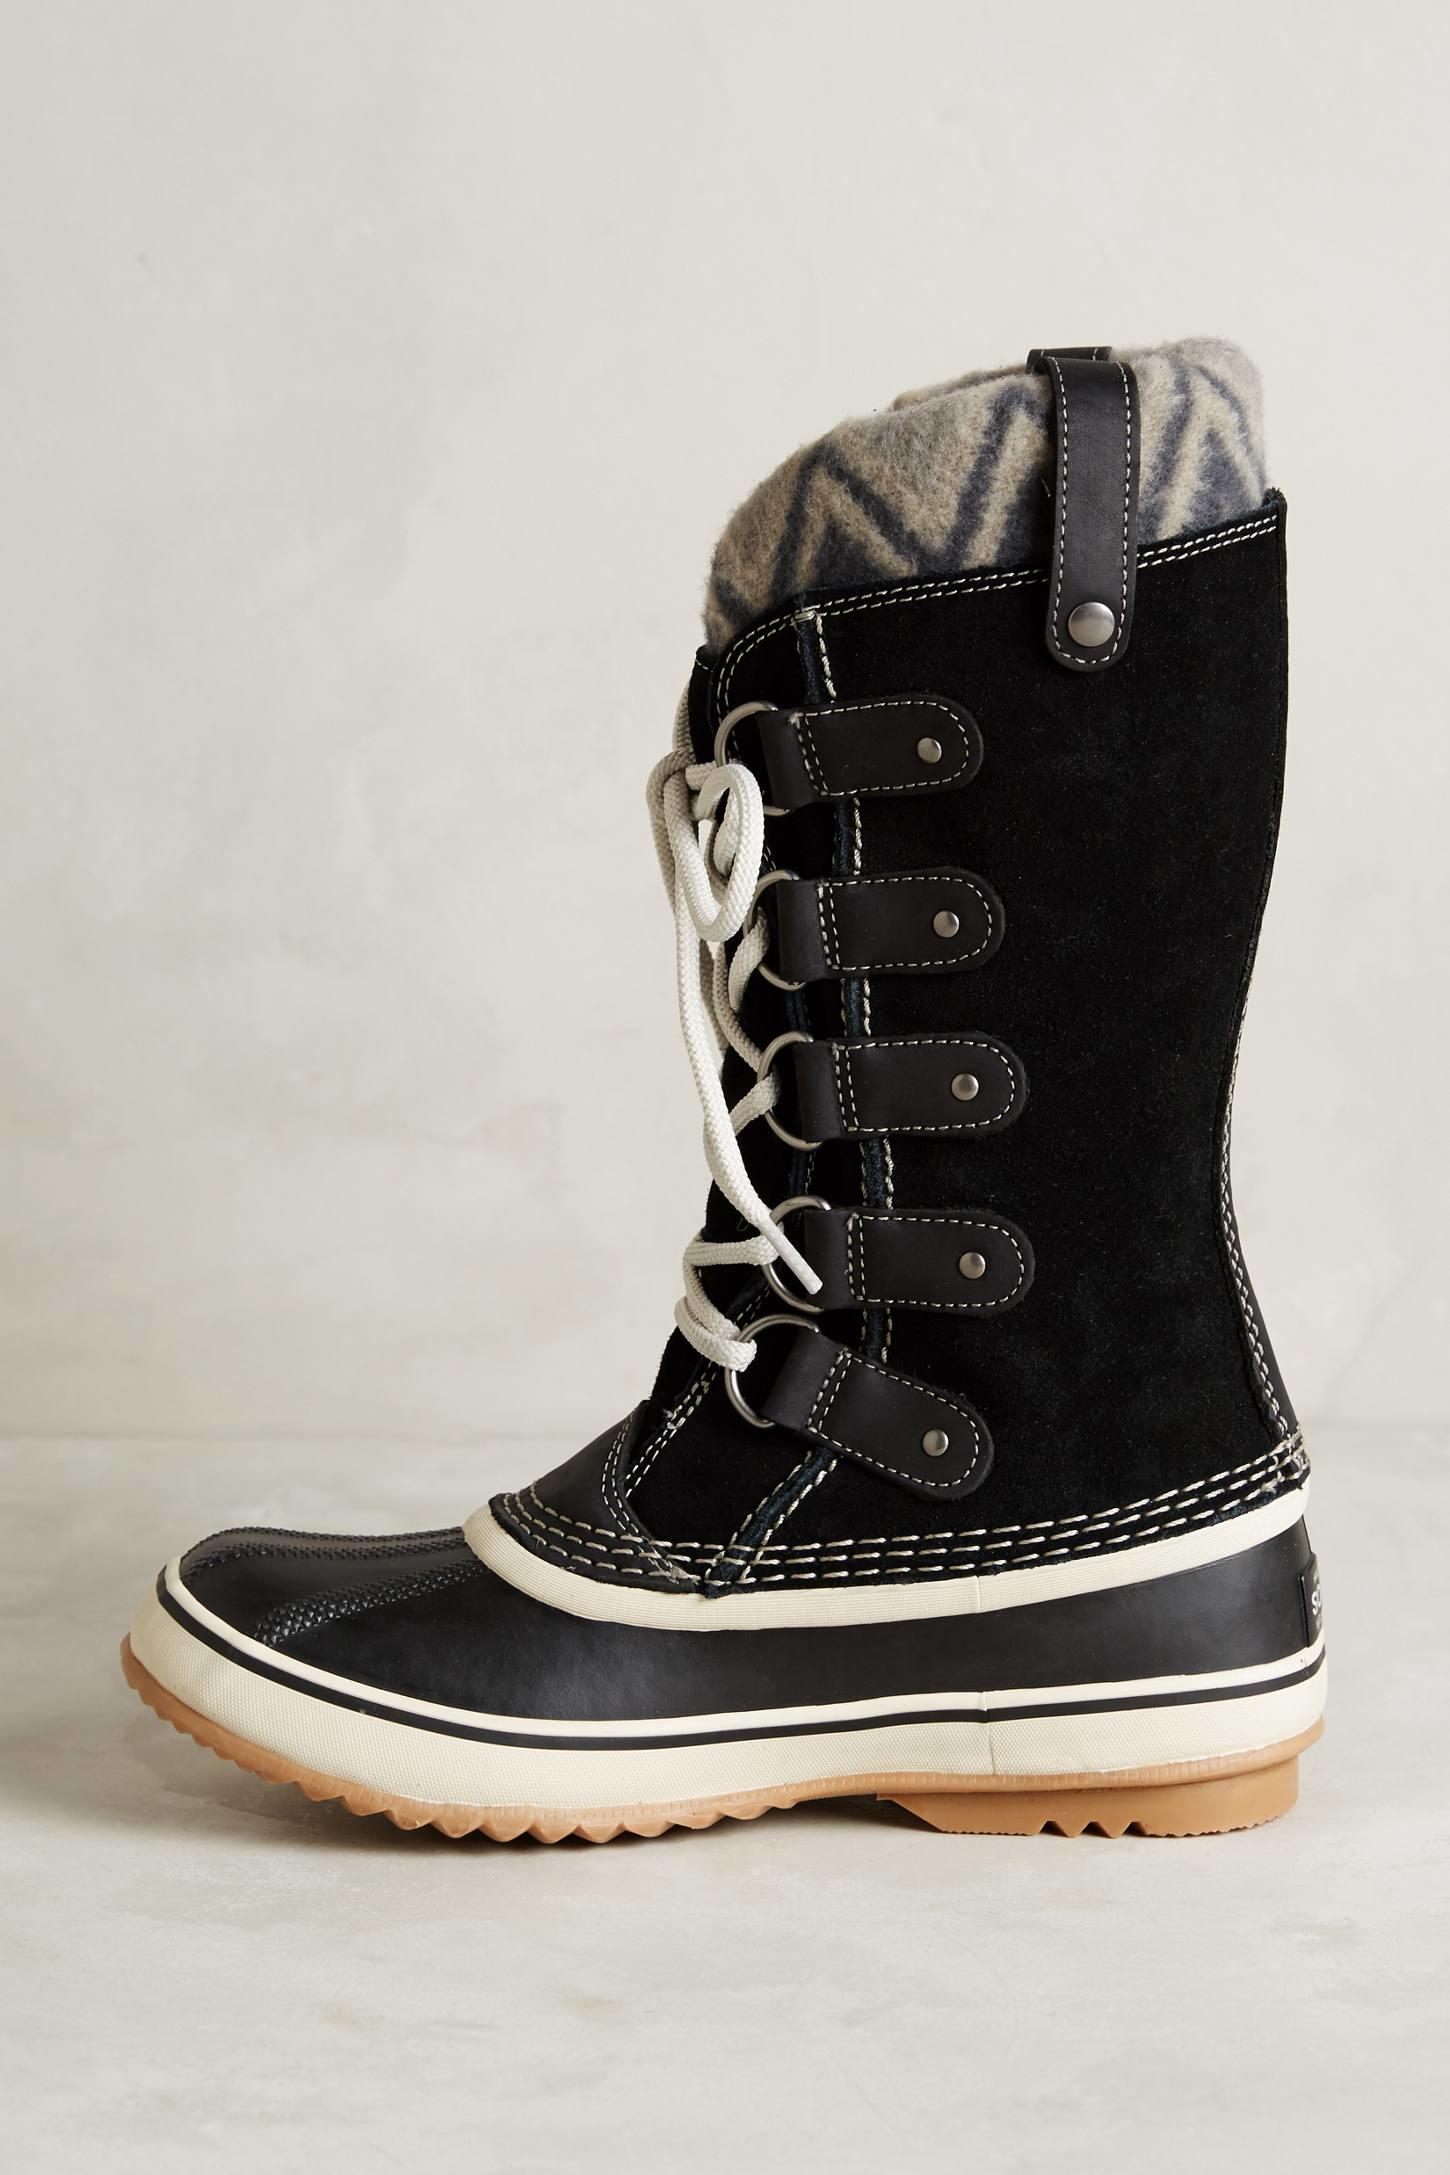 sorel joan of arctic knit boots in black lyst. Black Bedroom Furniture Sets. Home Design Ideas